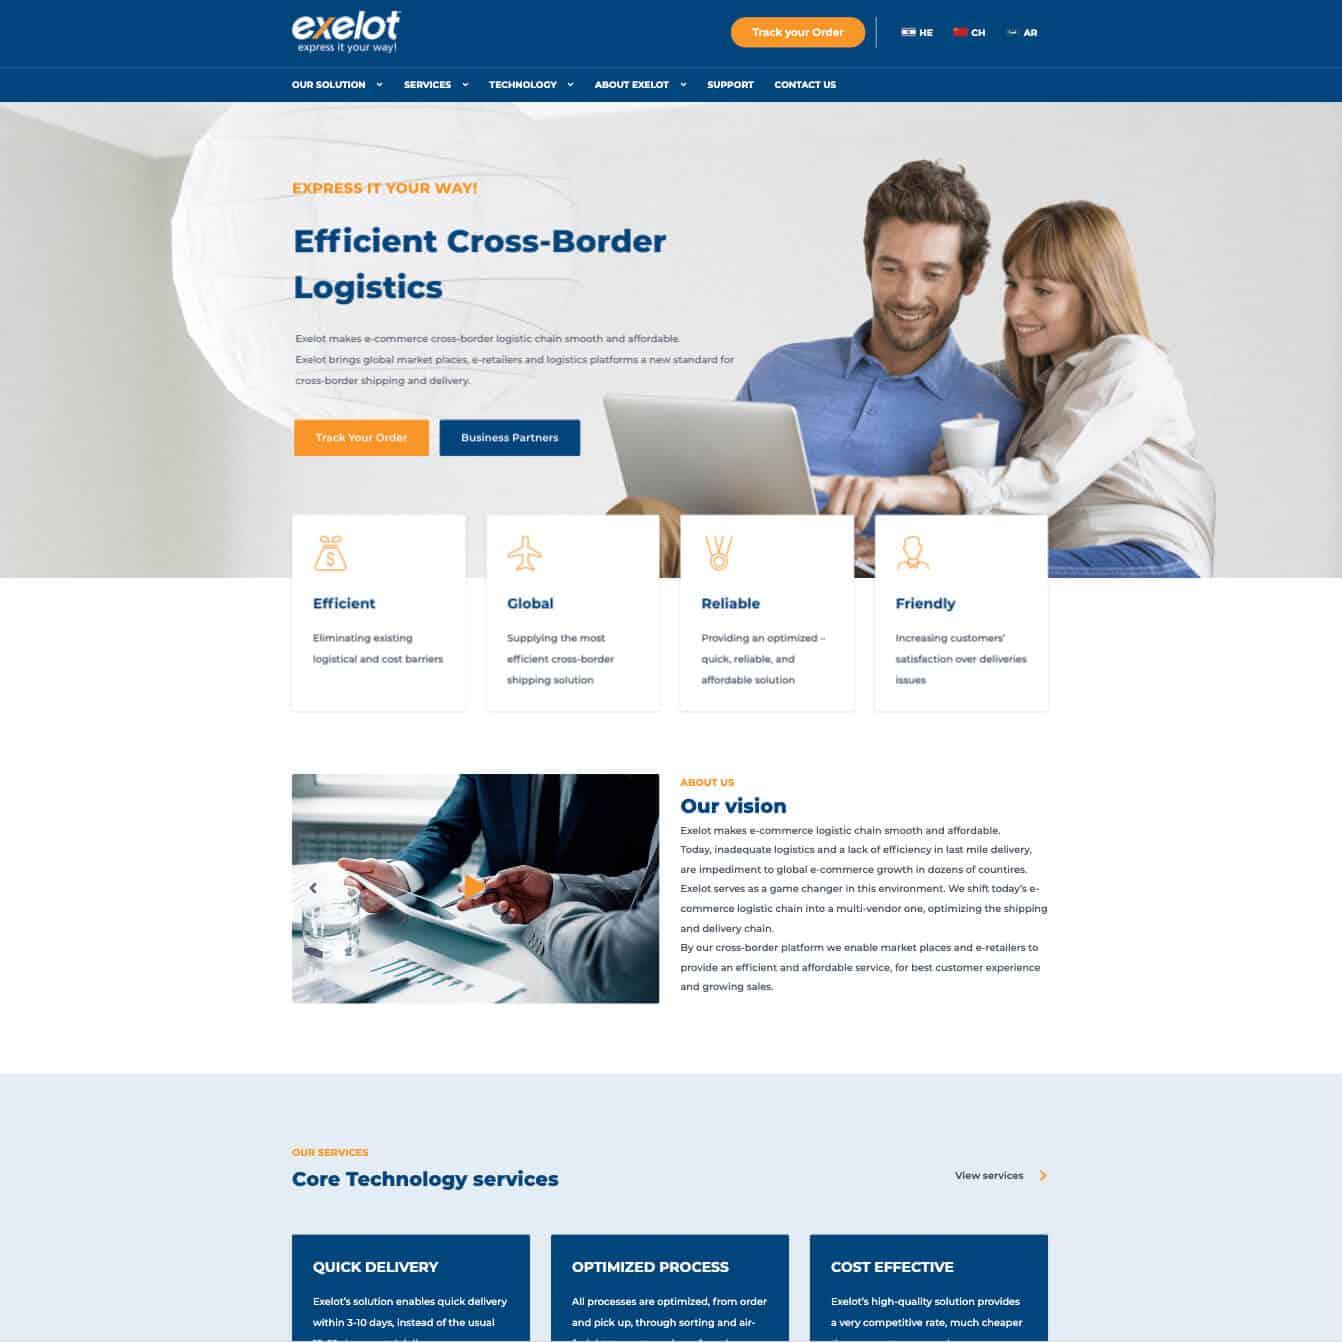 Exelot: Cross-Border Logistics - Smooth Cross-Border Shipping